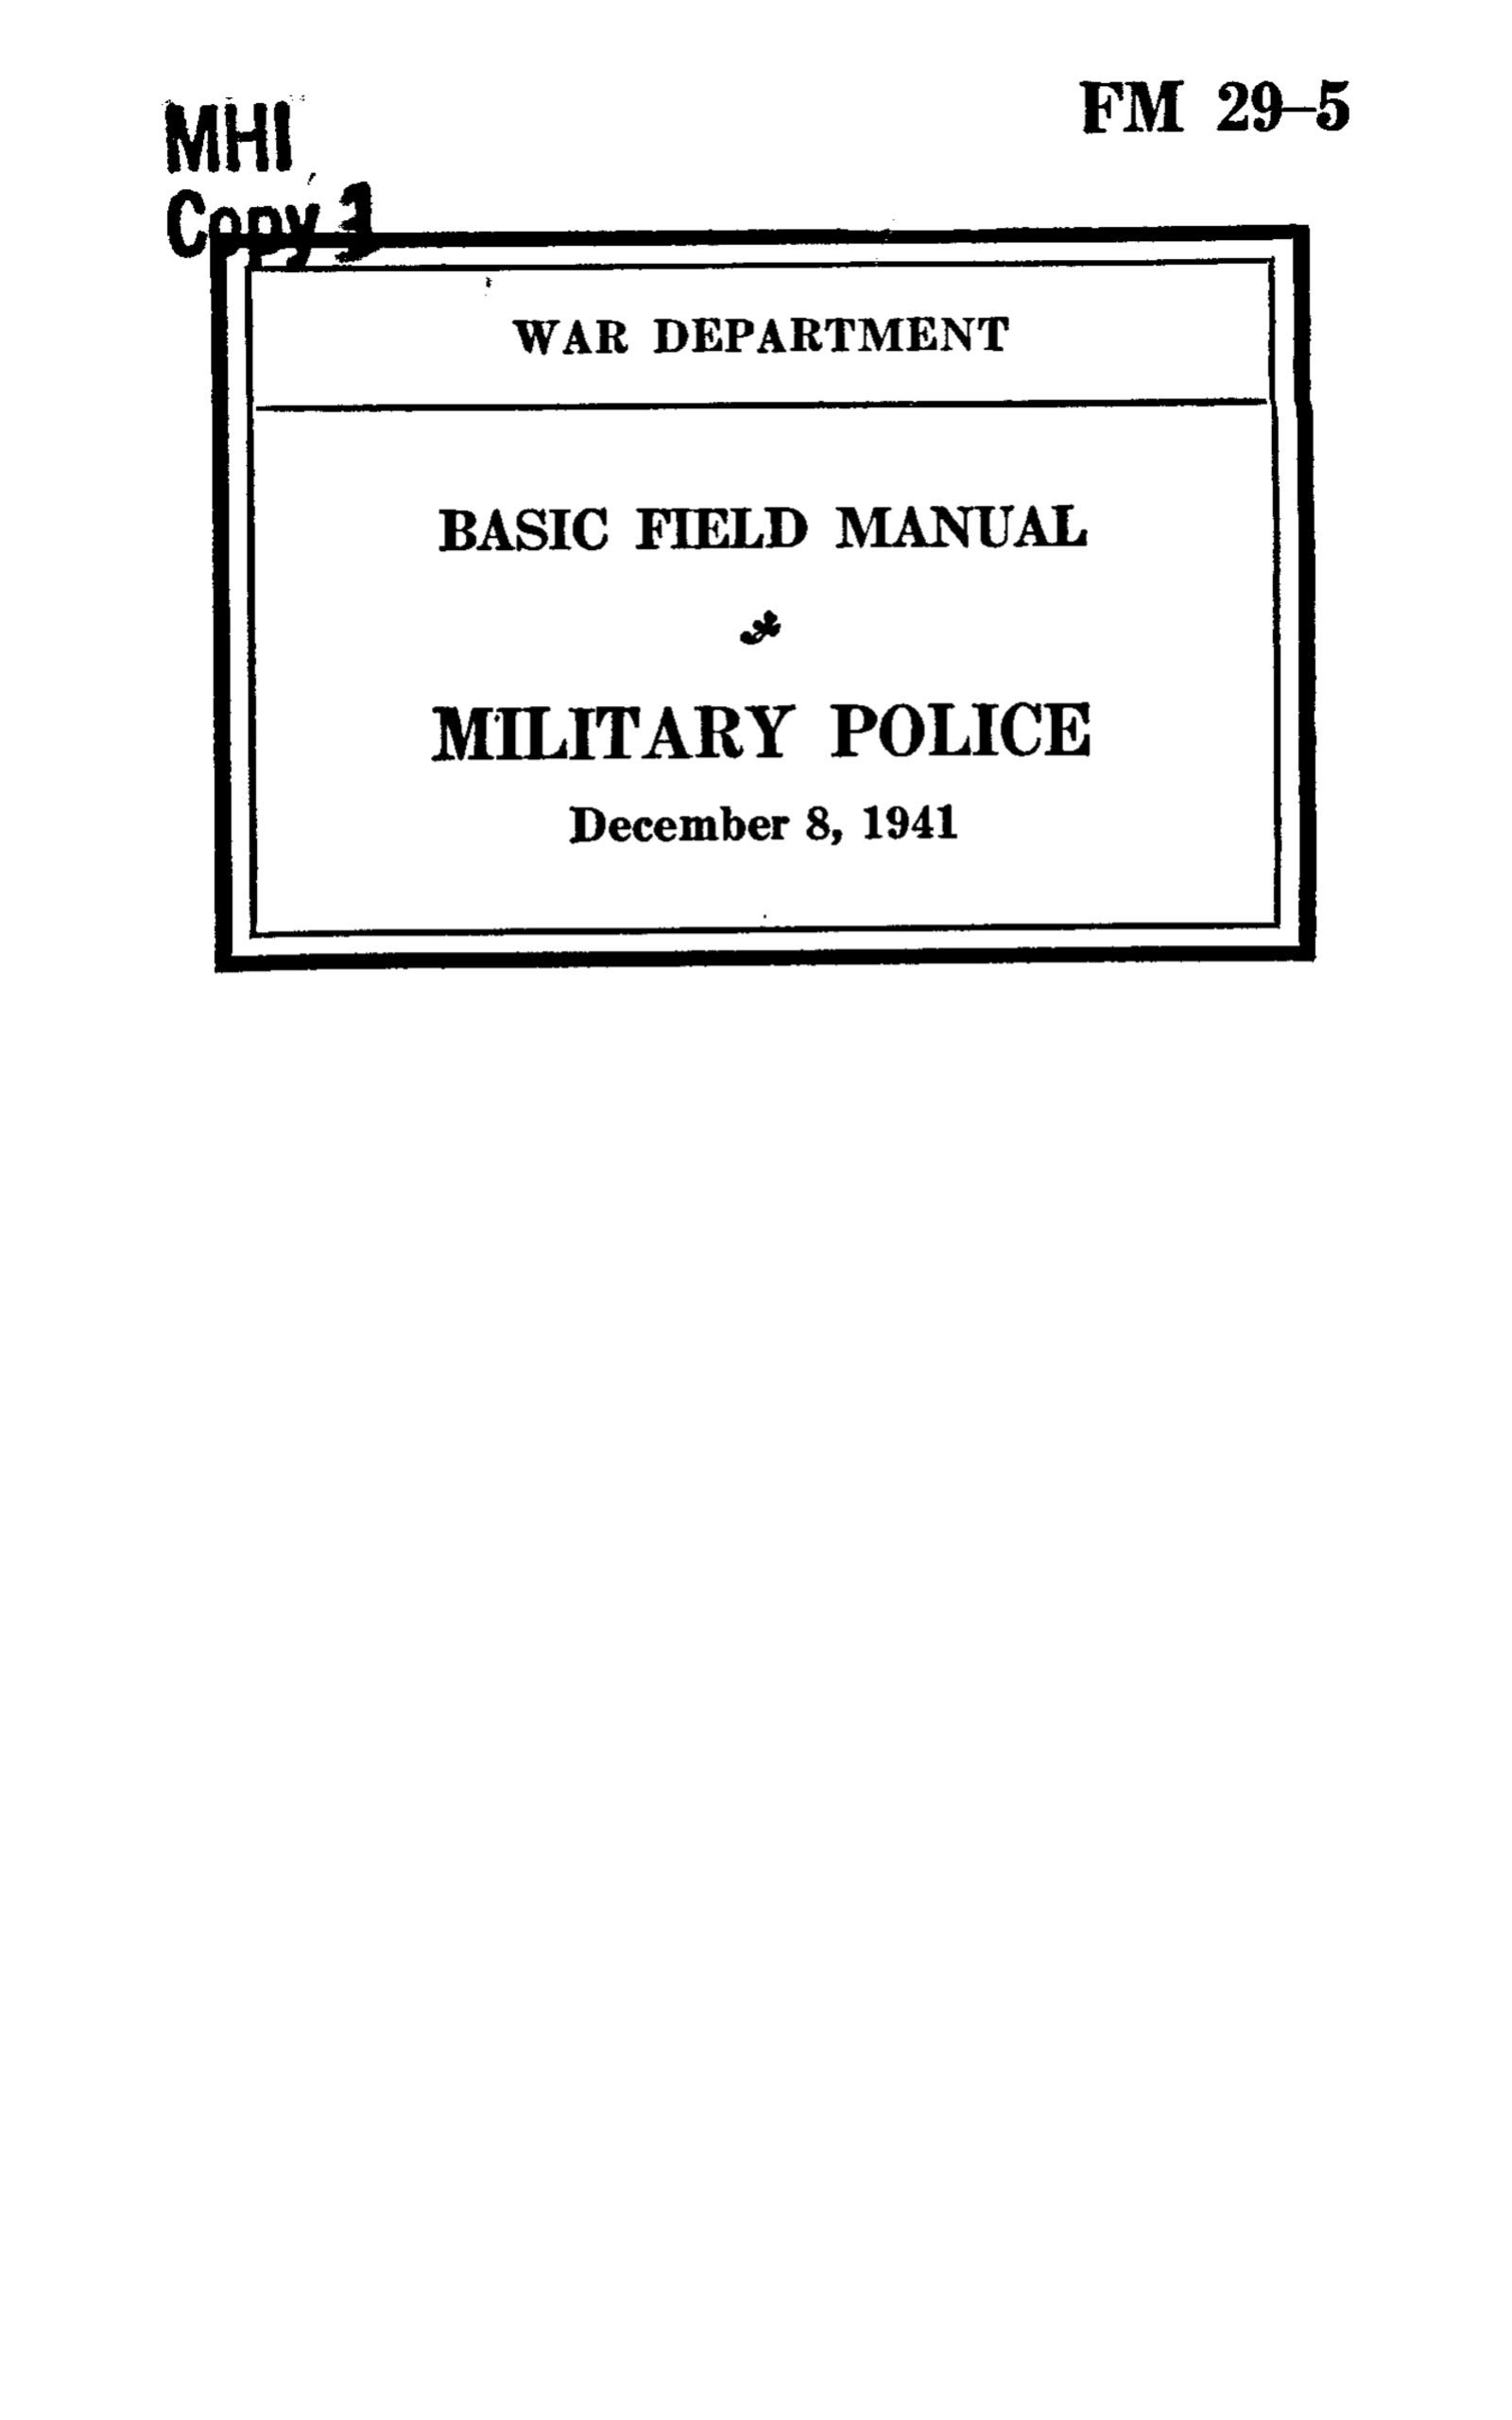 FM 29-5 1941: Basic Field Manual, Military Police